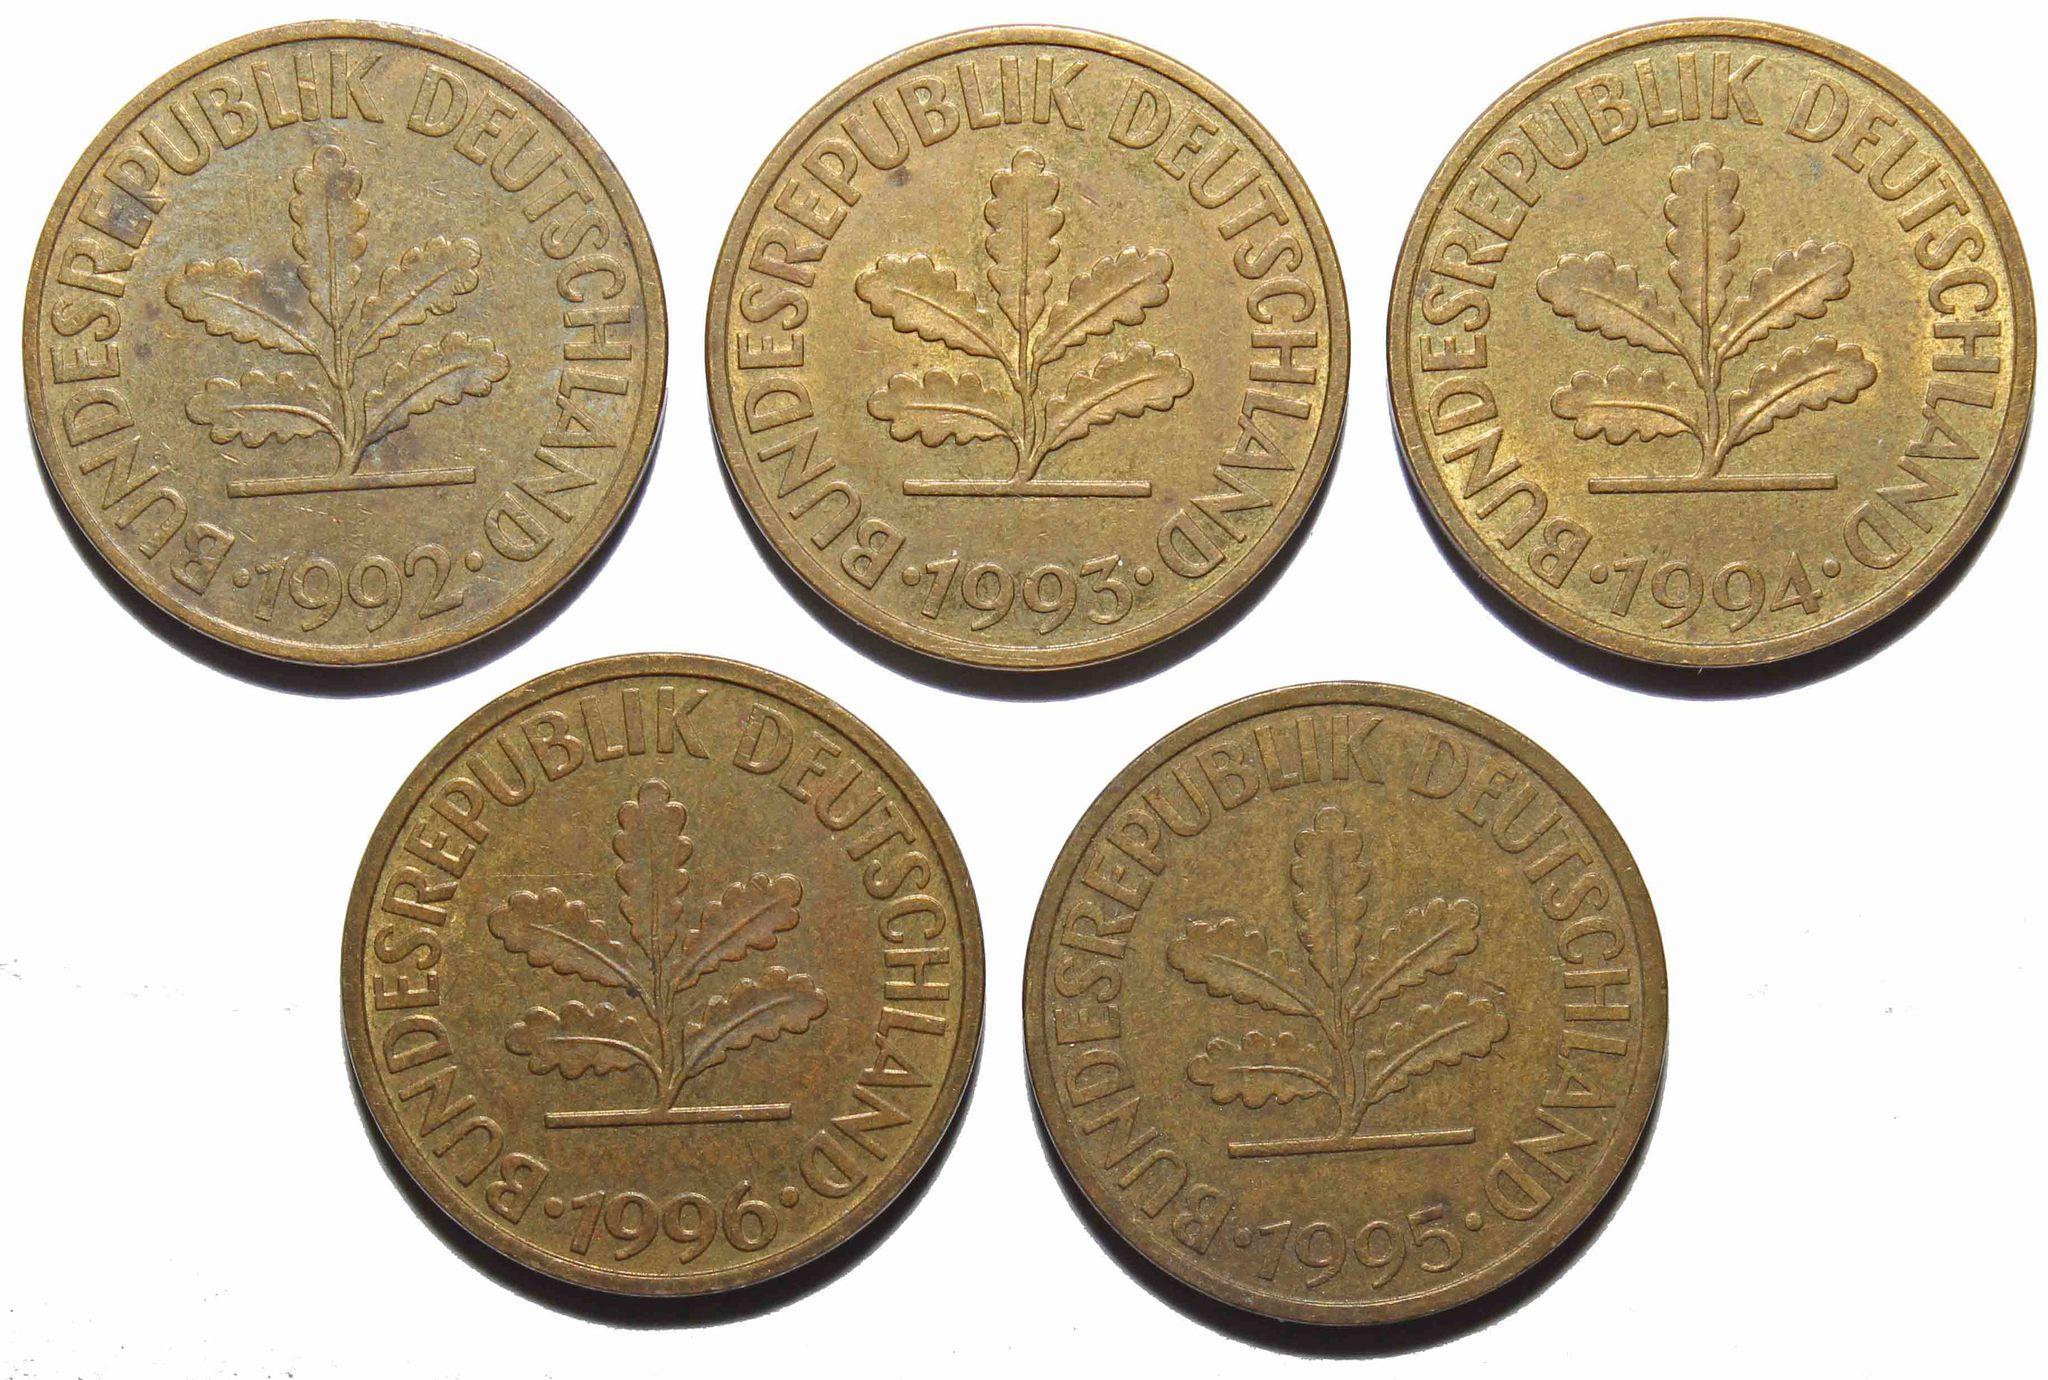 Набор из 5 монет 10 пфеннигов Германия ФРГ 1992-1996 гг. VF-XF